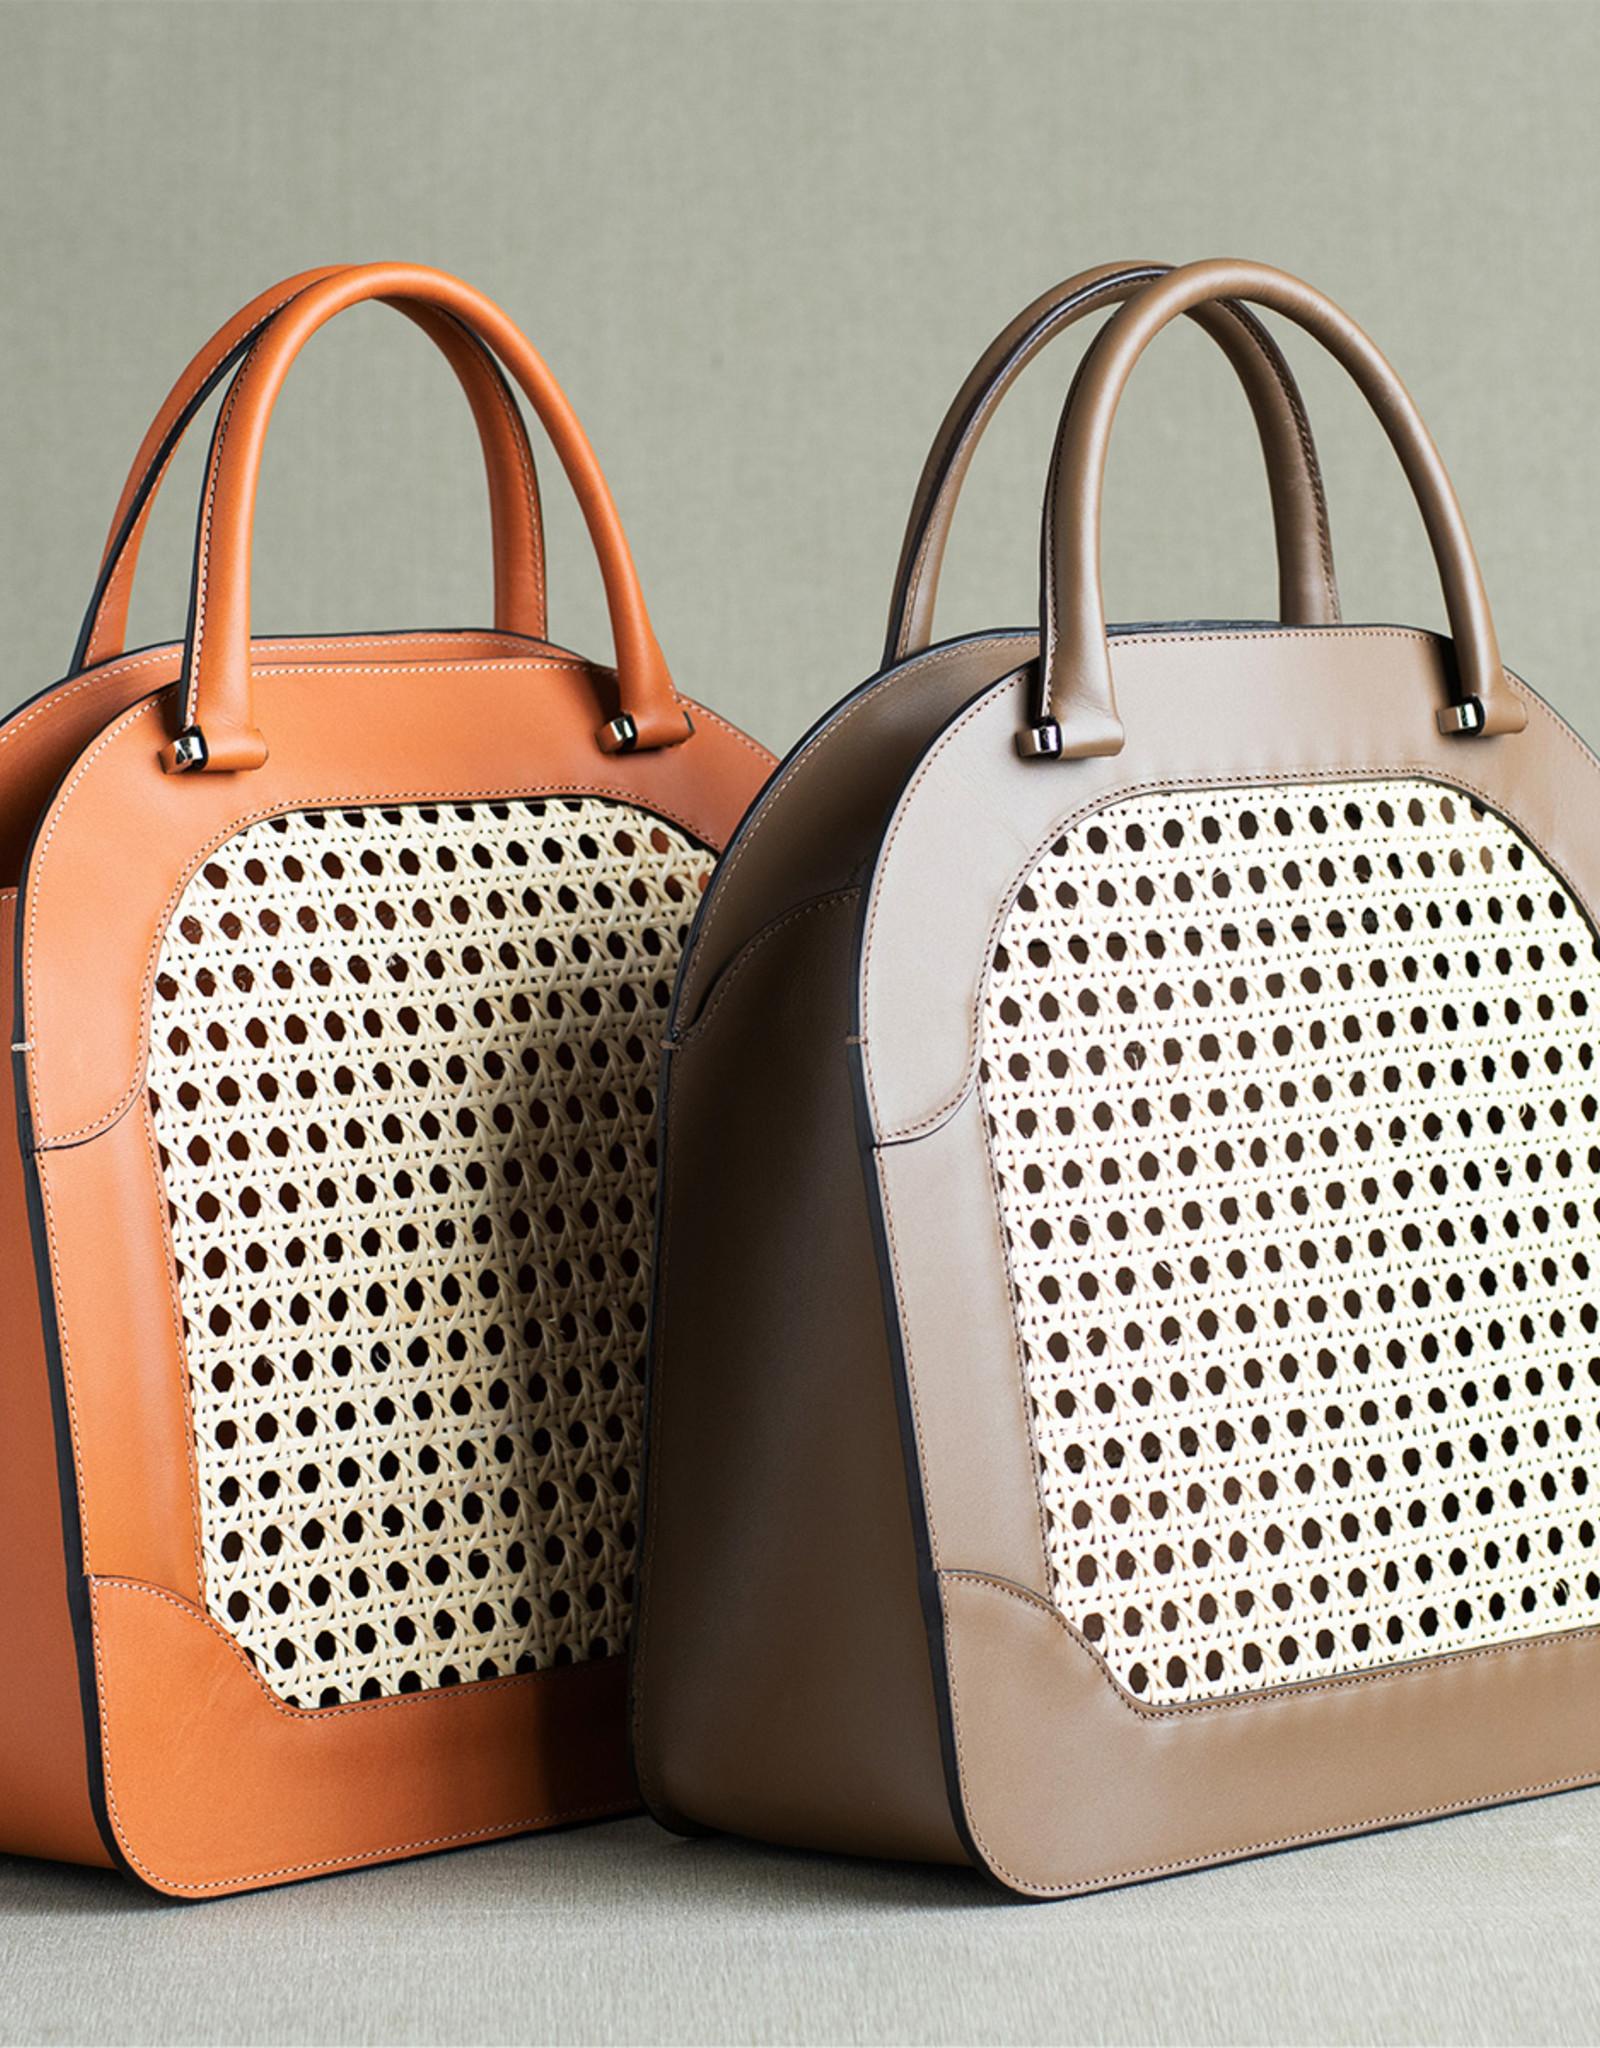 Rattan Bag 125 by Palmgrens | Tan leather